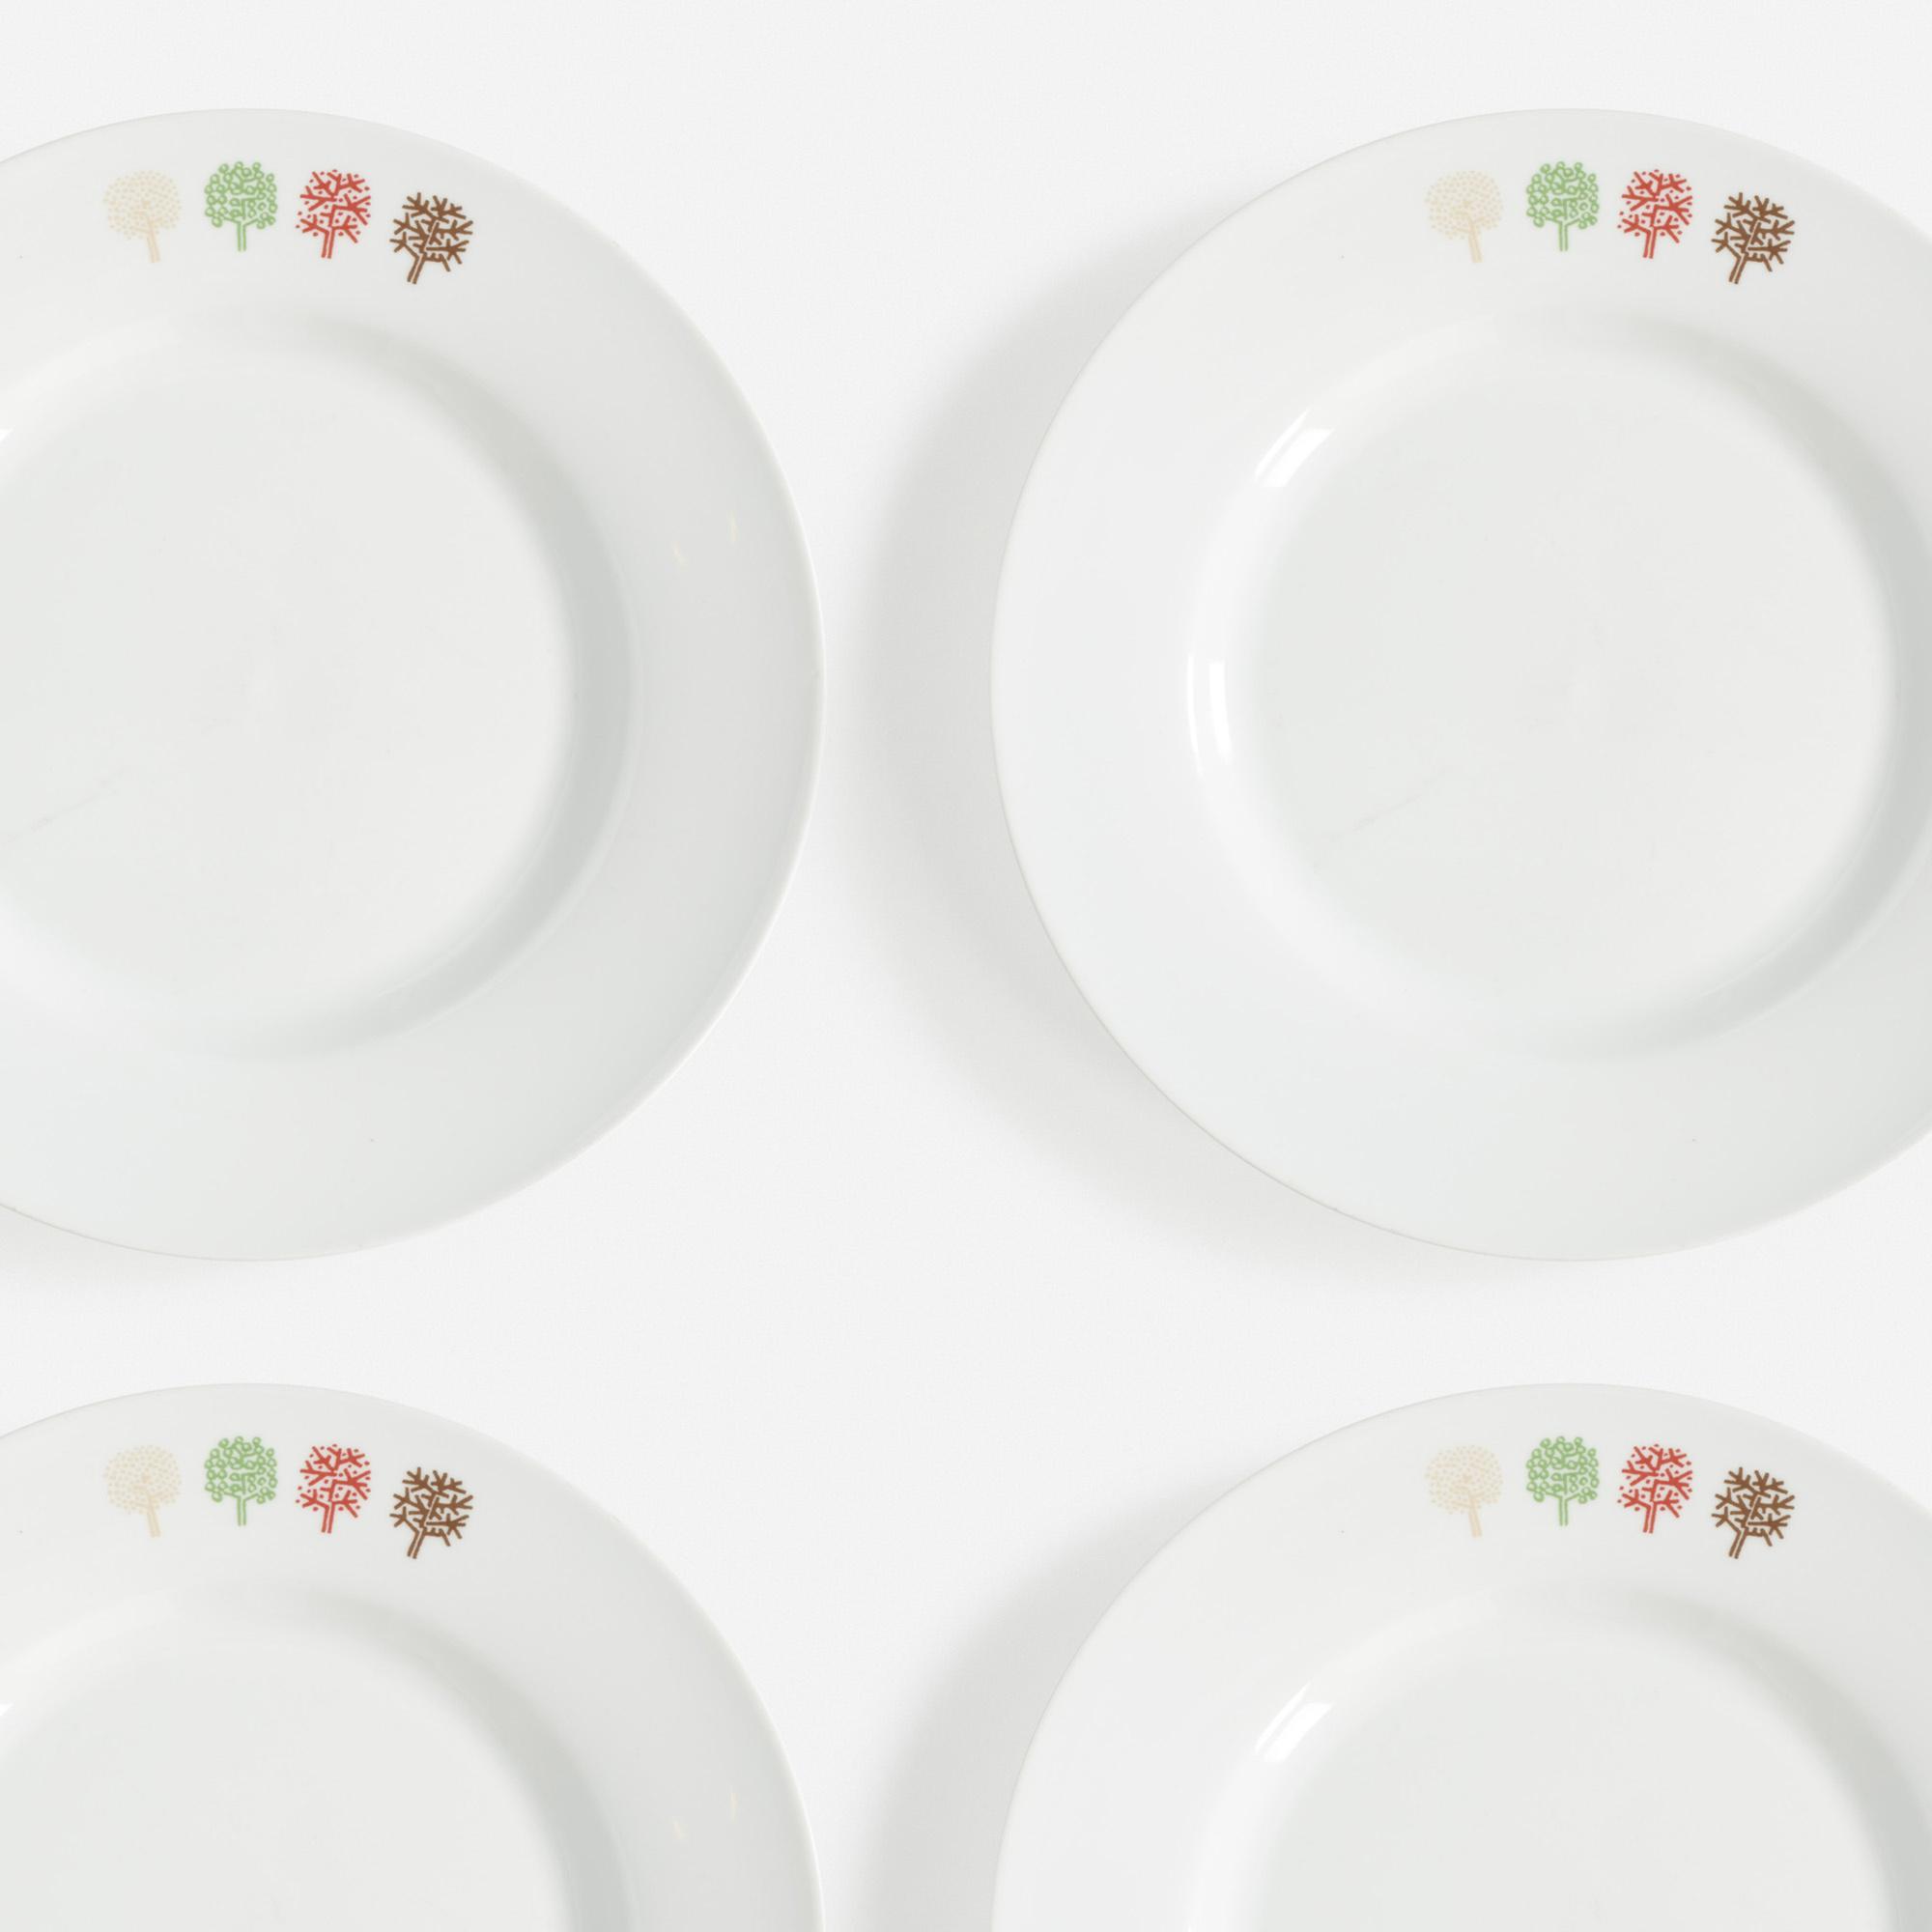 309:  / Four Seasons plates, set of twelve (1 of 1)